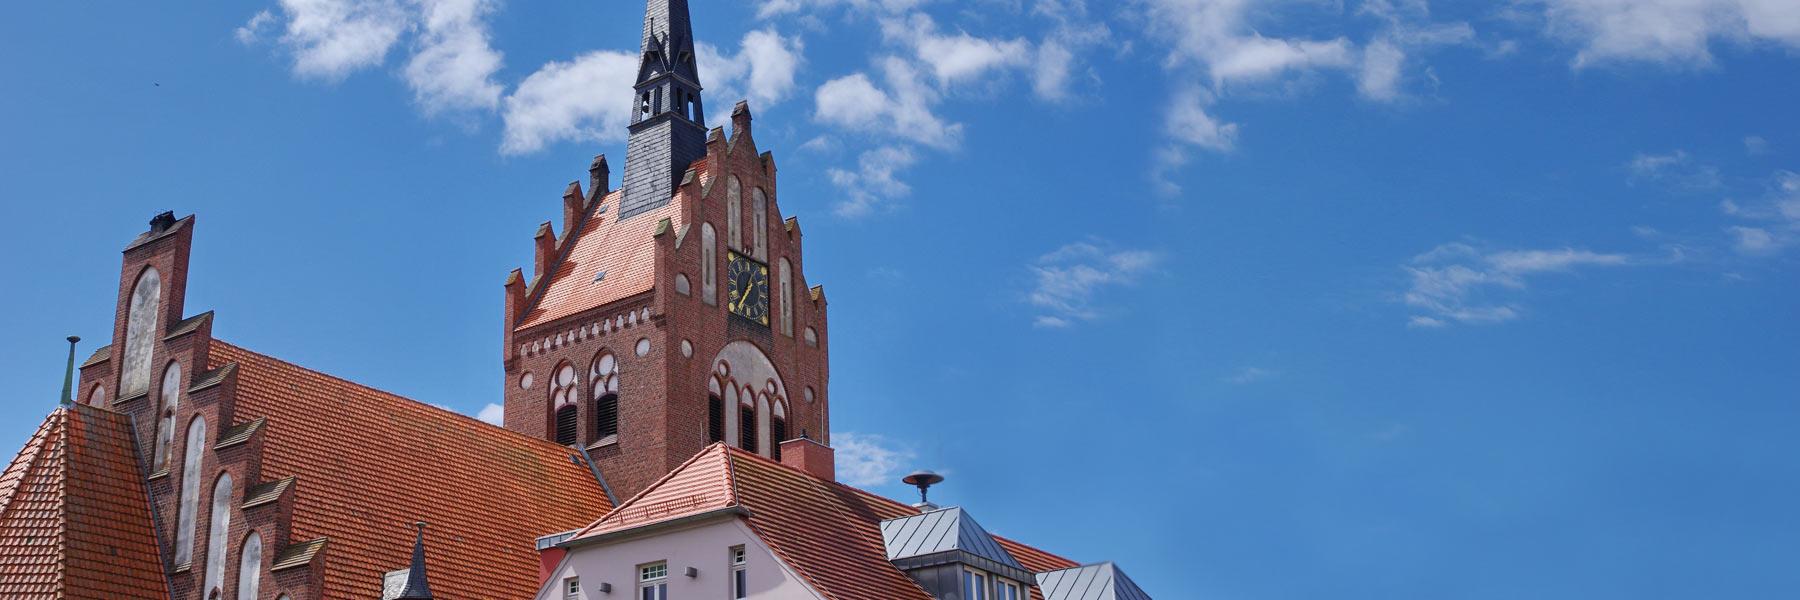 Marienkirche - Usedom (Stadt)